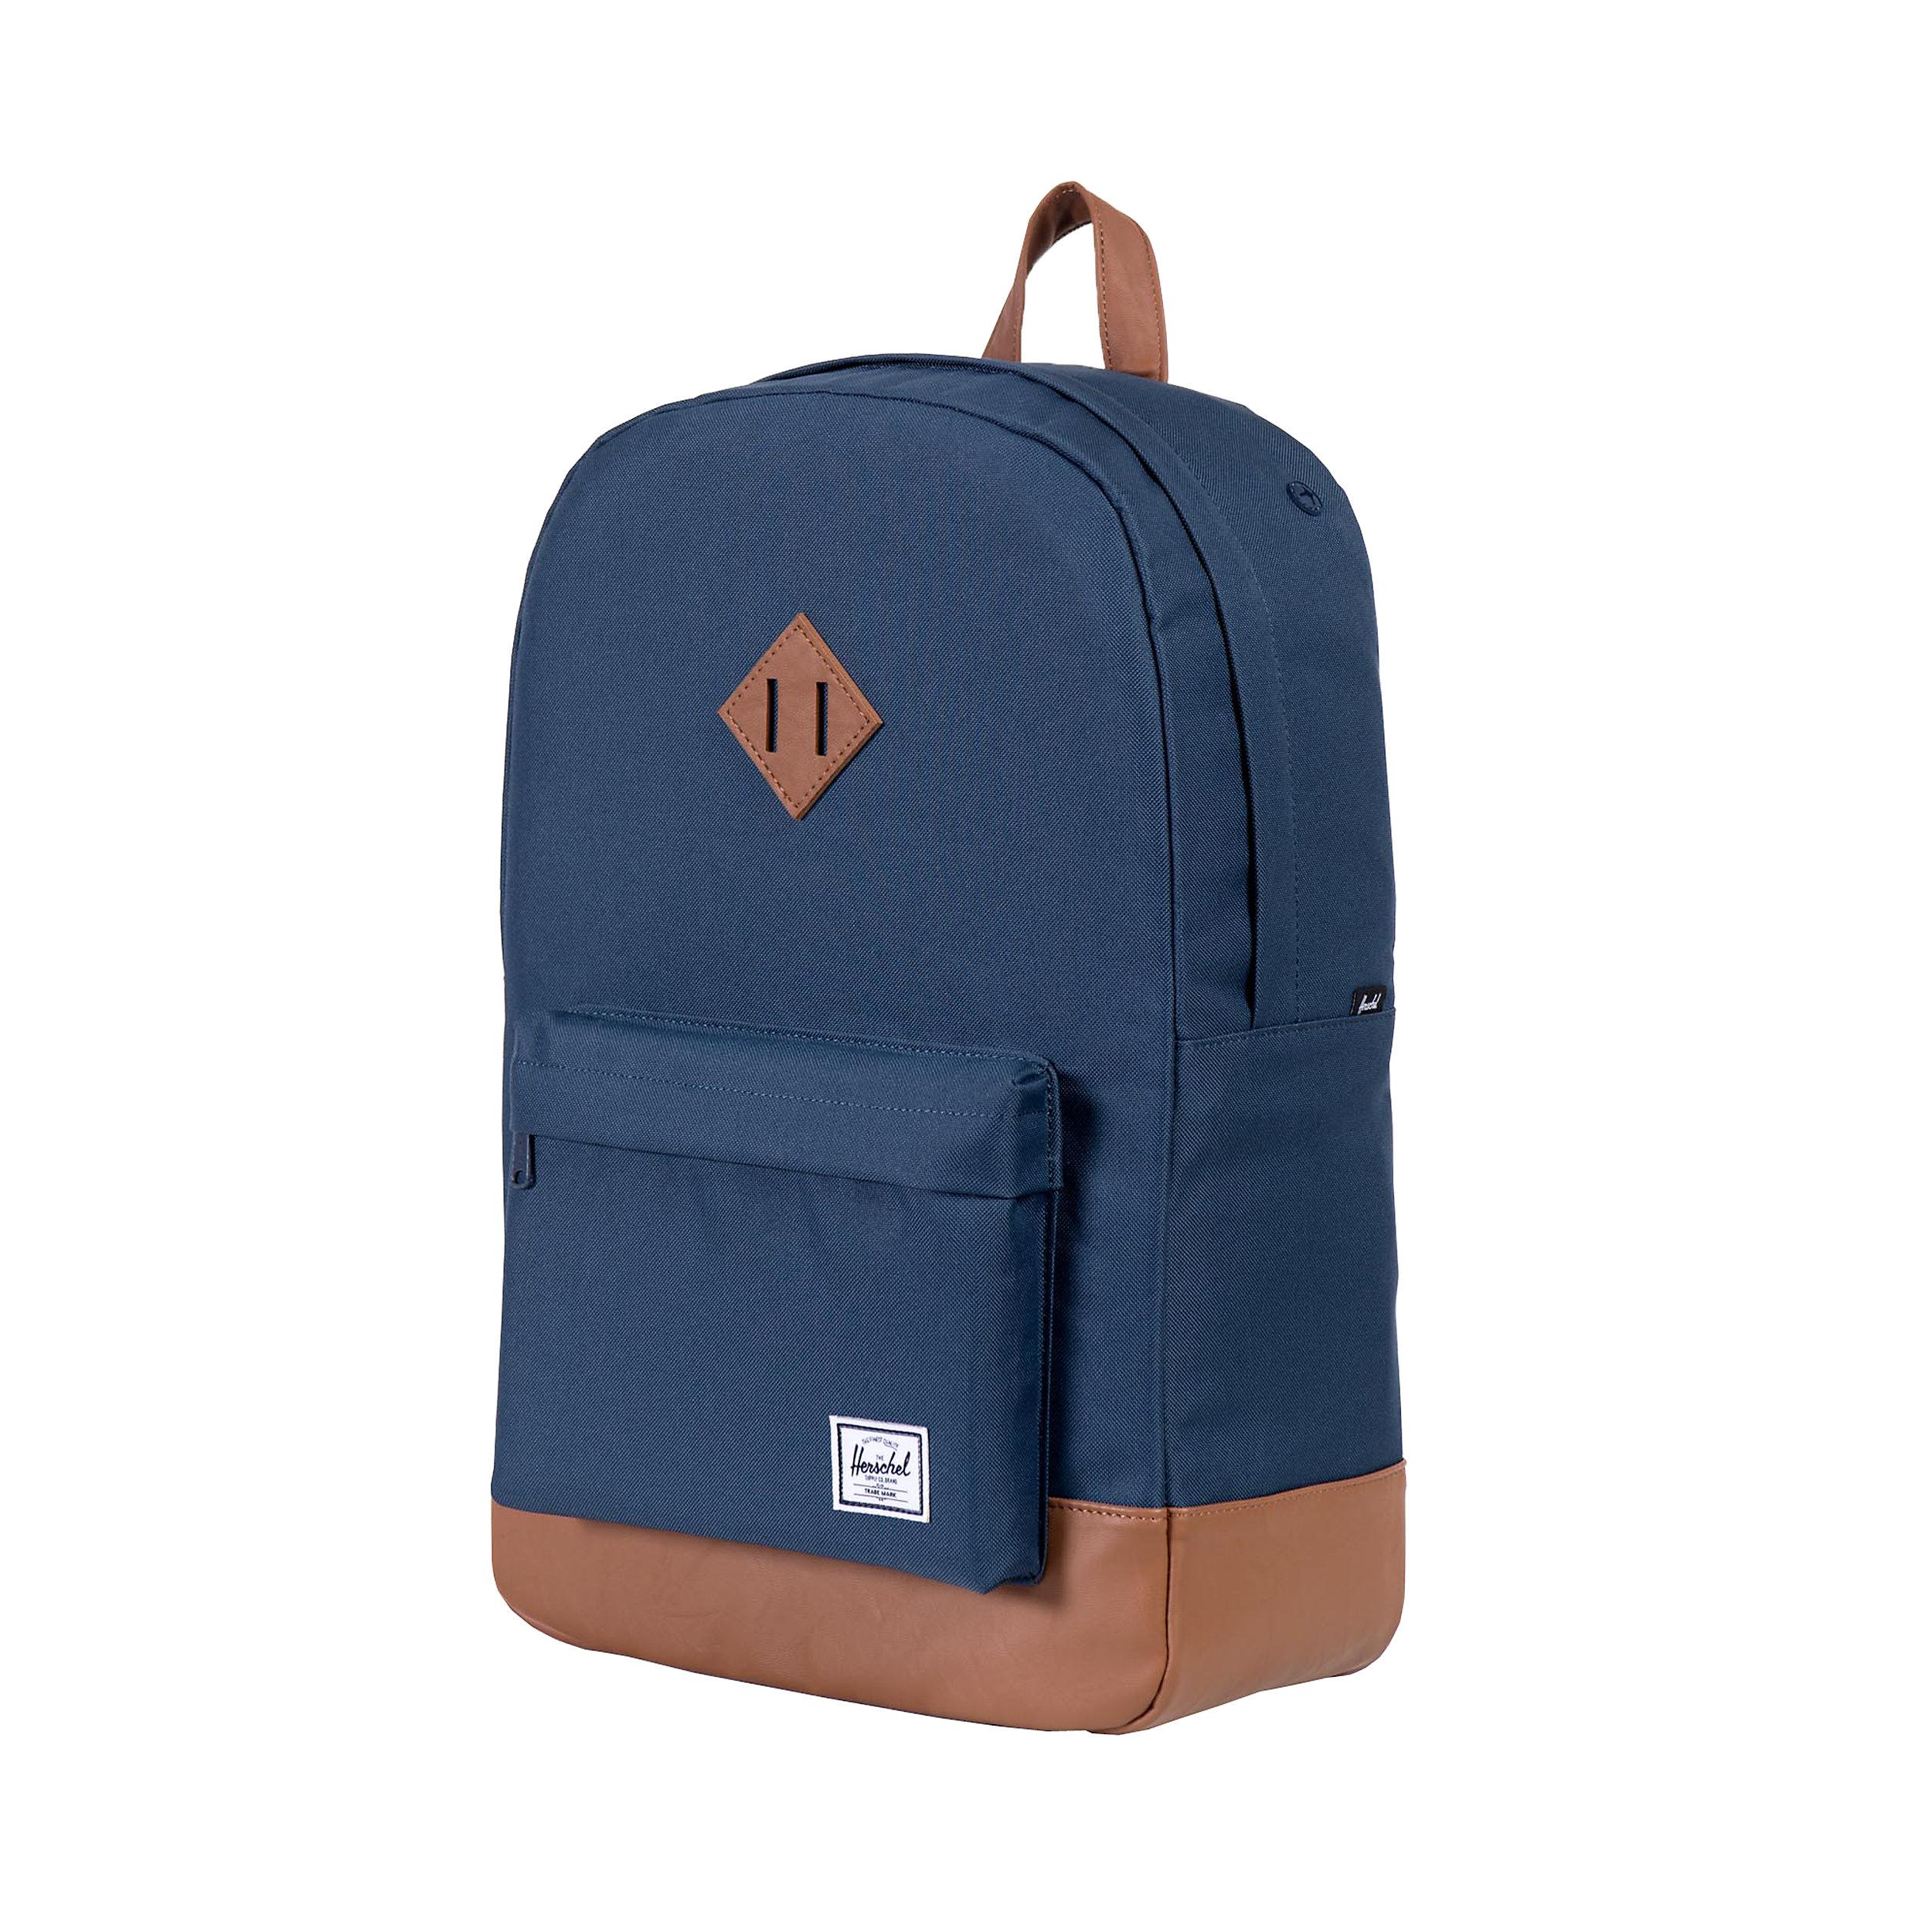 Backpack Heritage Classics Backpacks 21.5 Liter